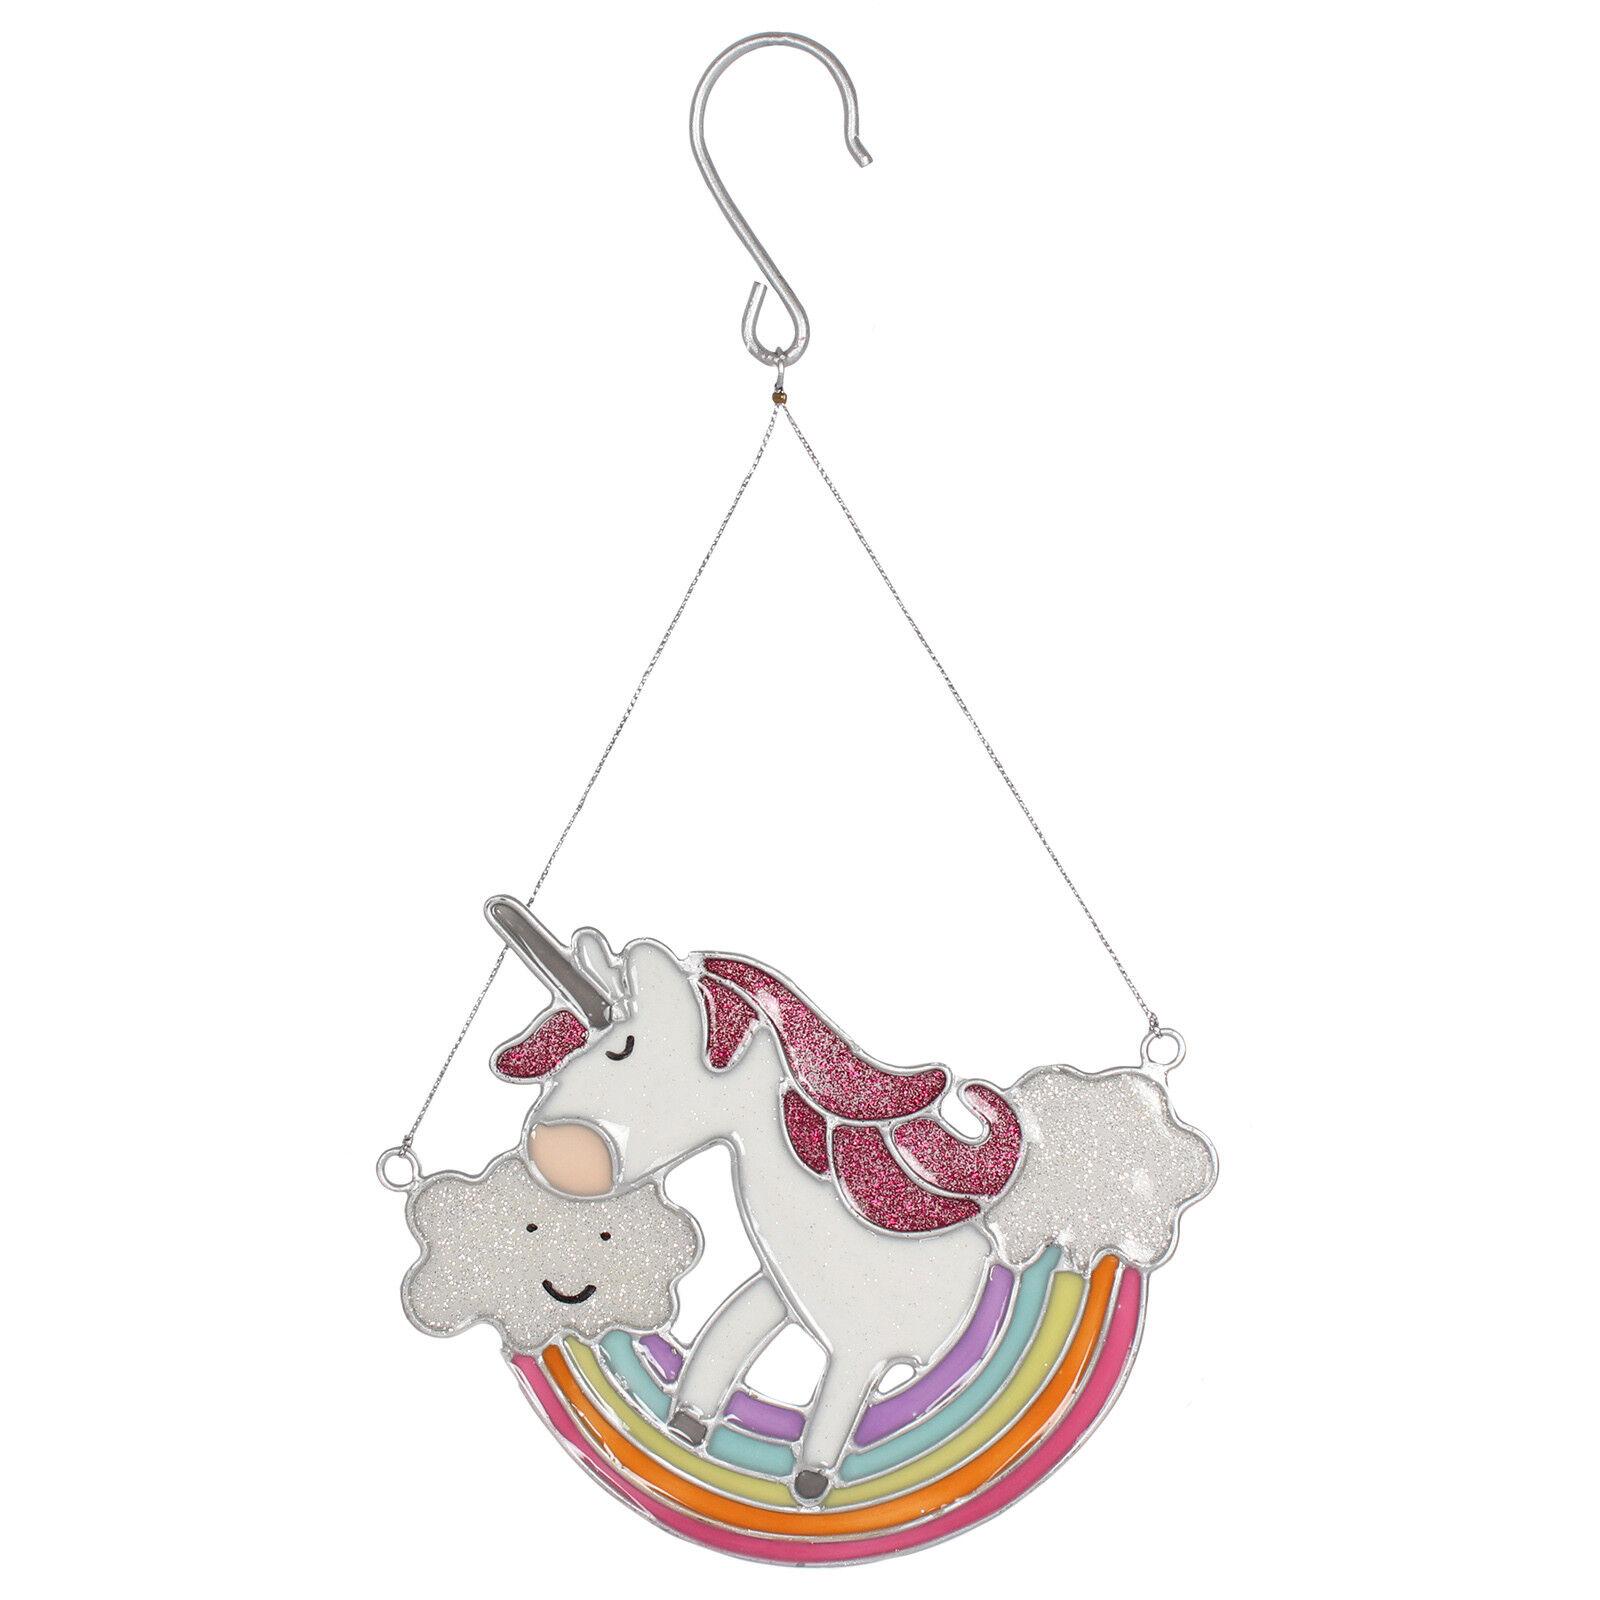 Magical Rainbow Unicorn Glitter Sun Catcher Home Garden Hanging Mobile Decor